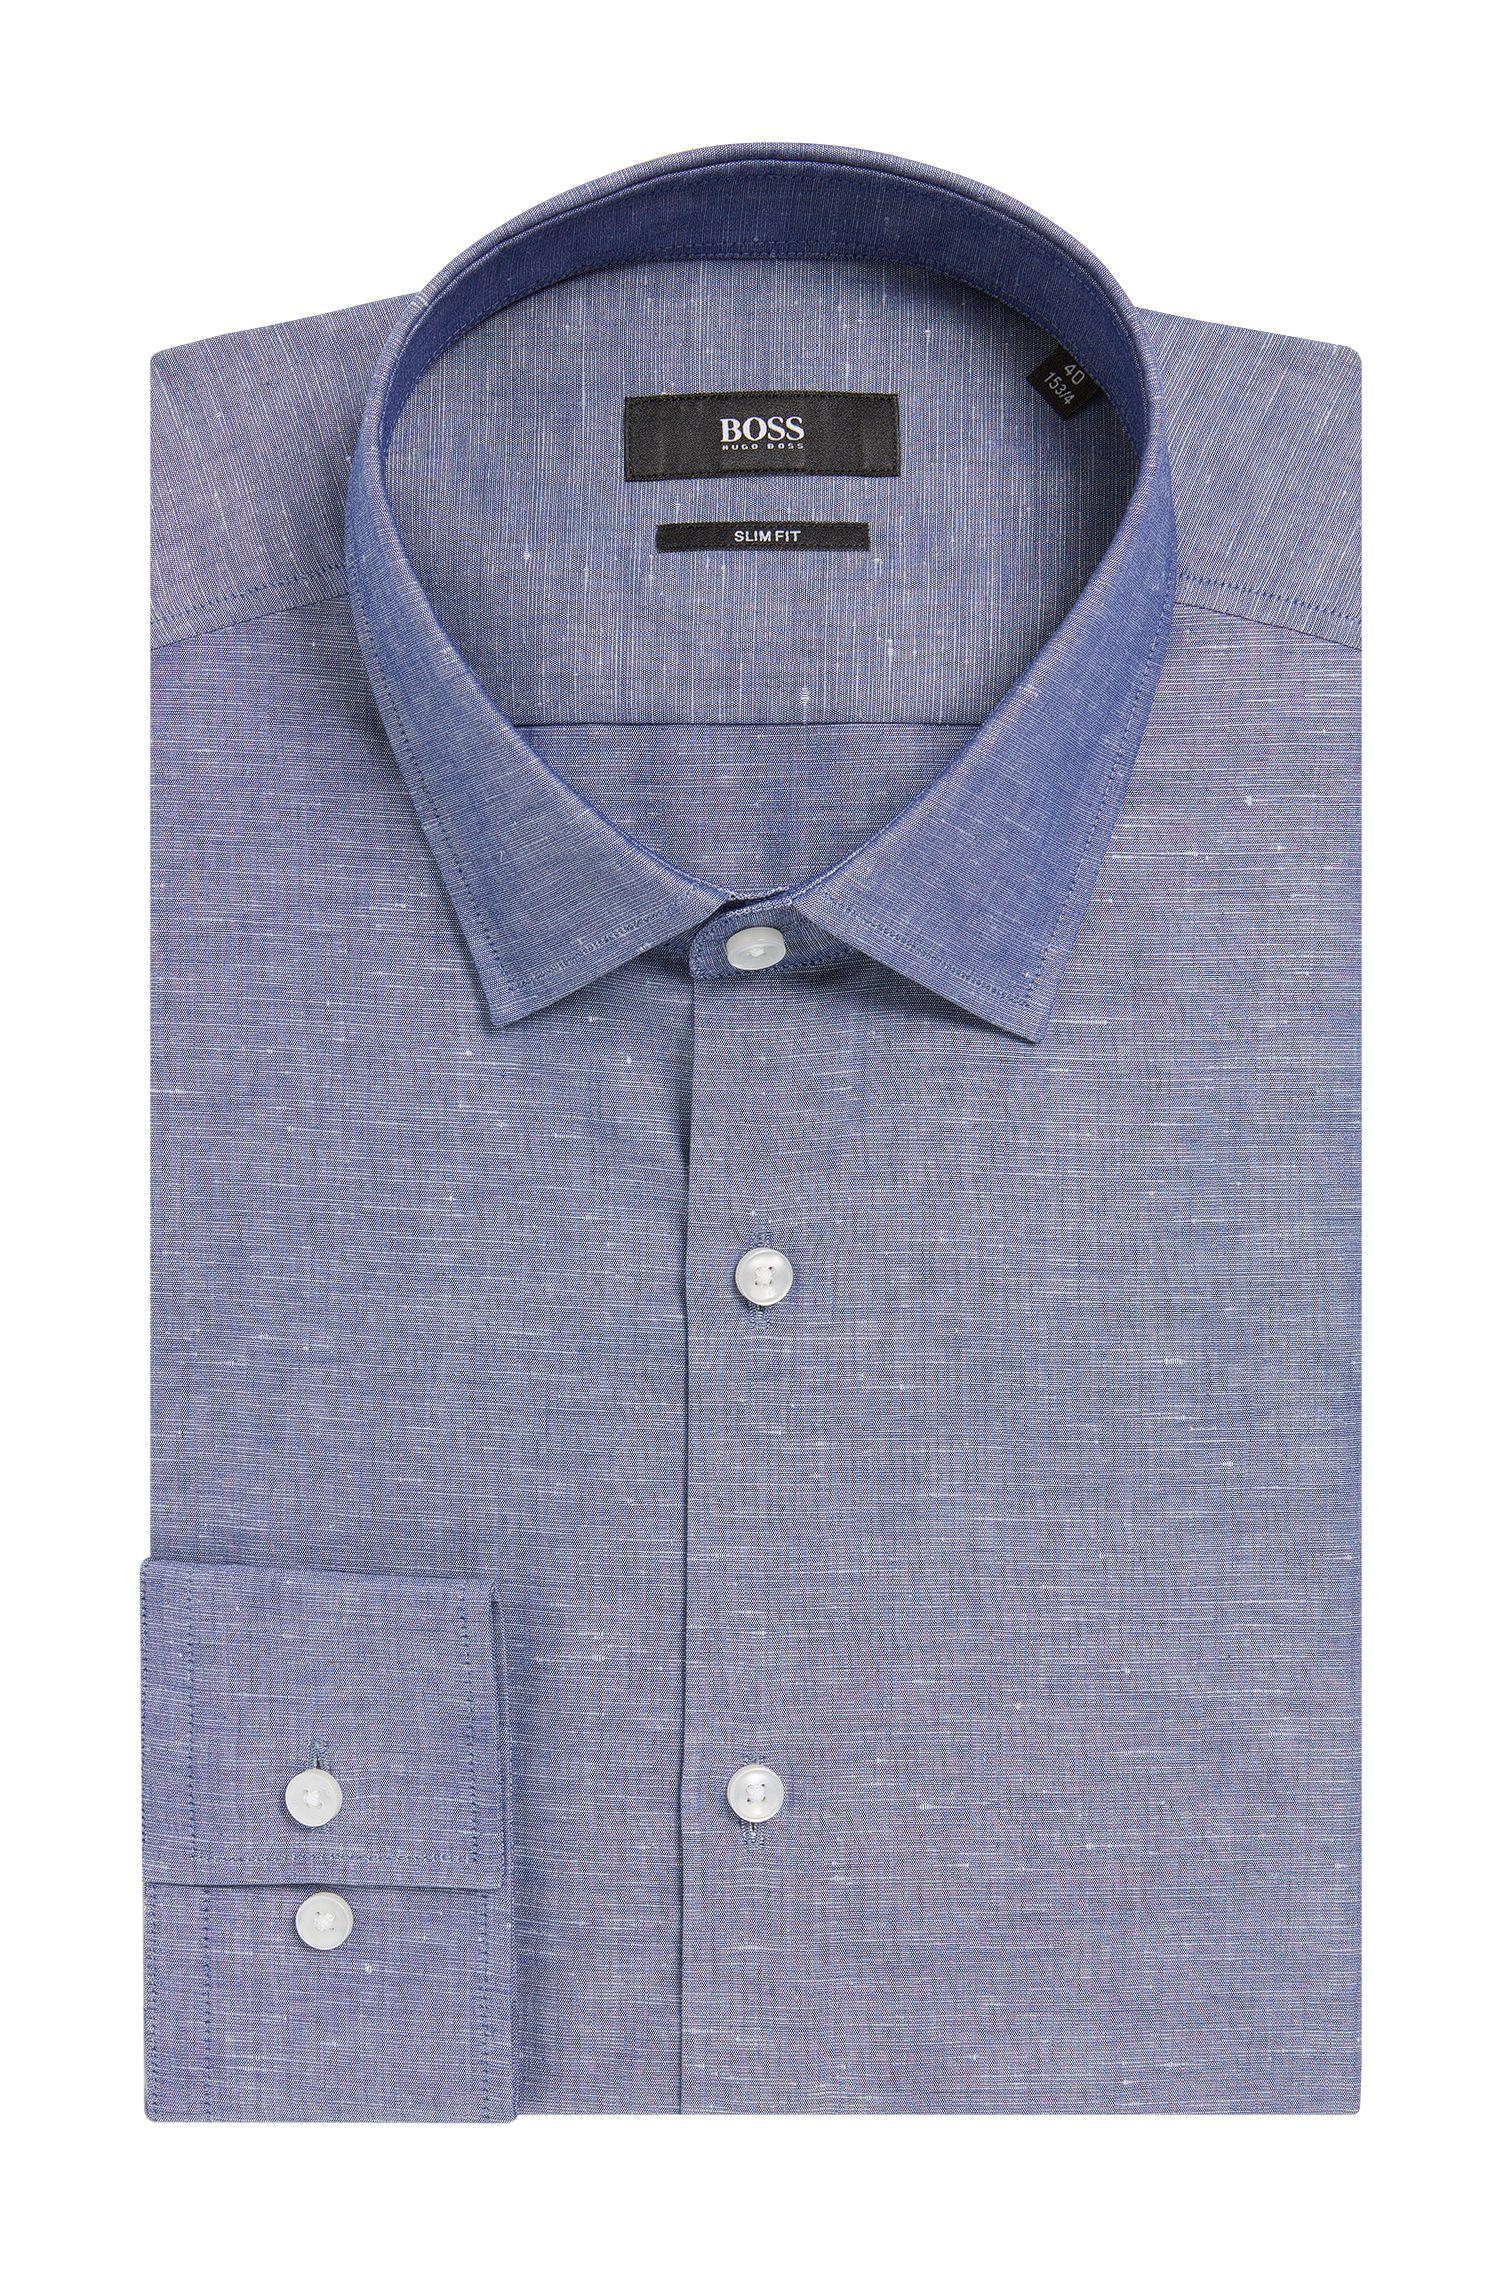 Italian Cotton Linen Dress Shirt, Slim Fit | Jenno